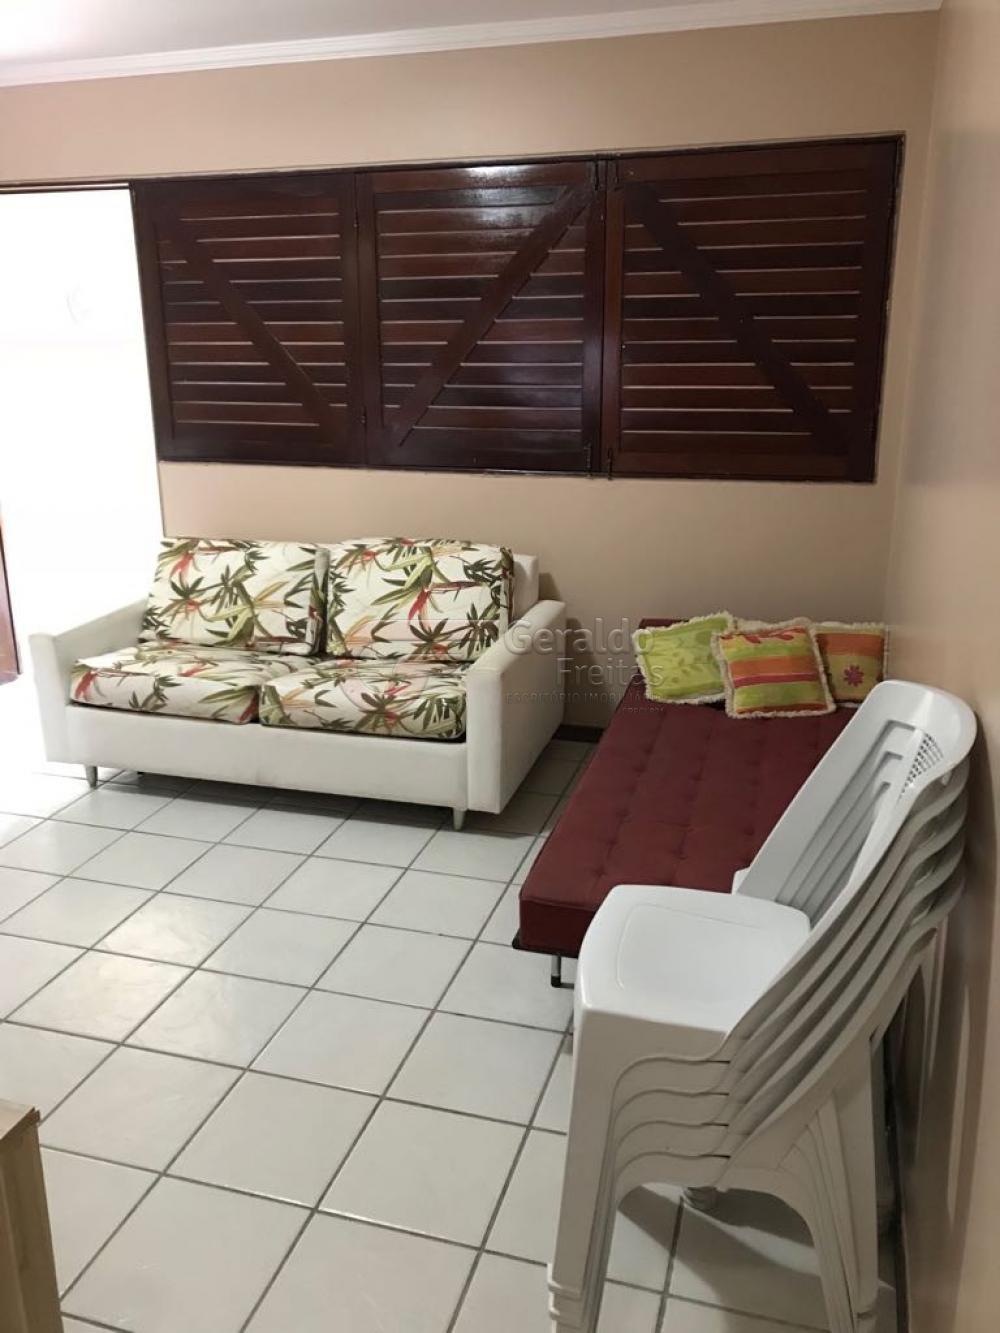 Alugar Apartamentos / Duplex em Marechal Deodoro apenas R$ 1.600,00 - Foto 26